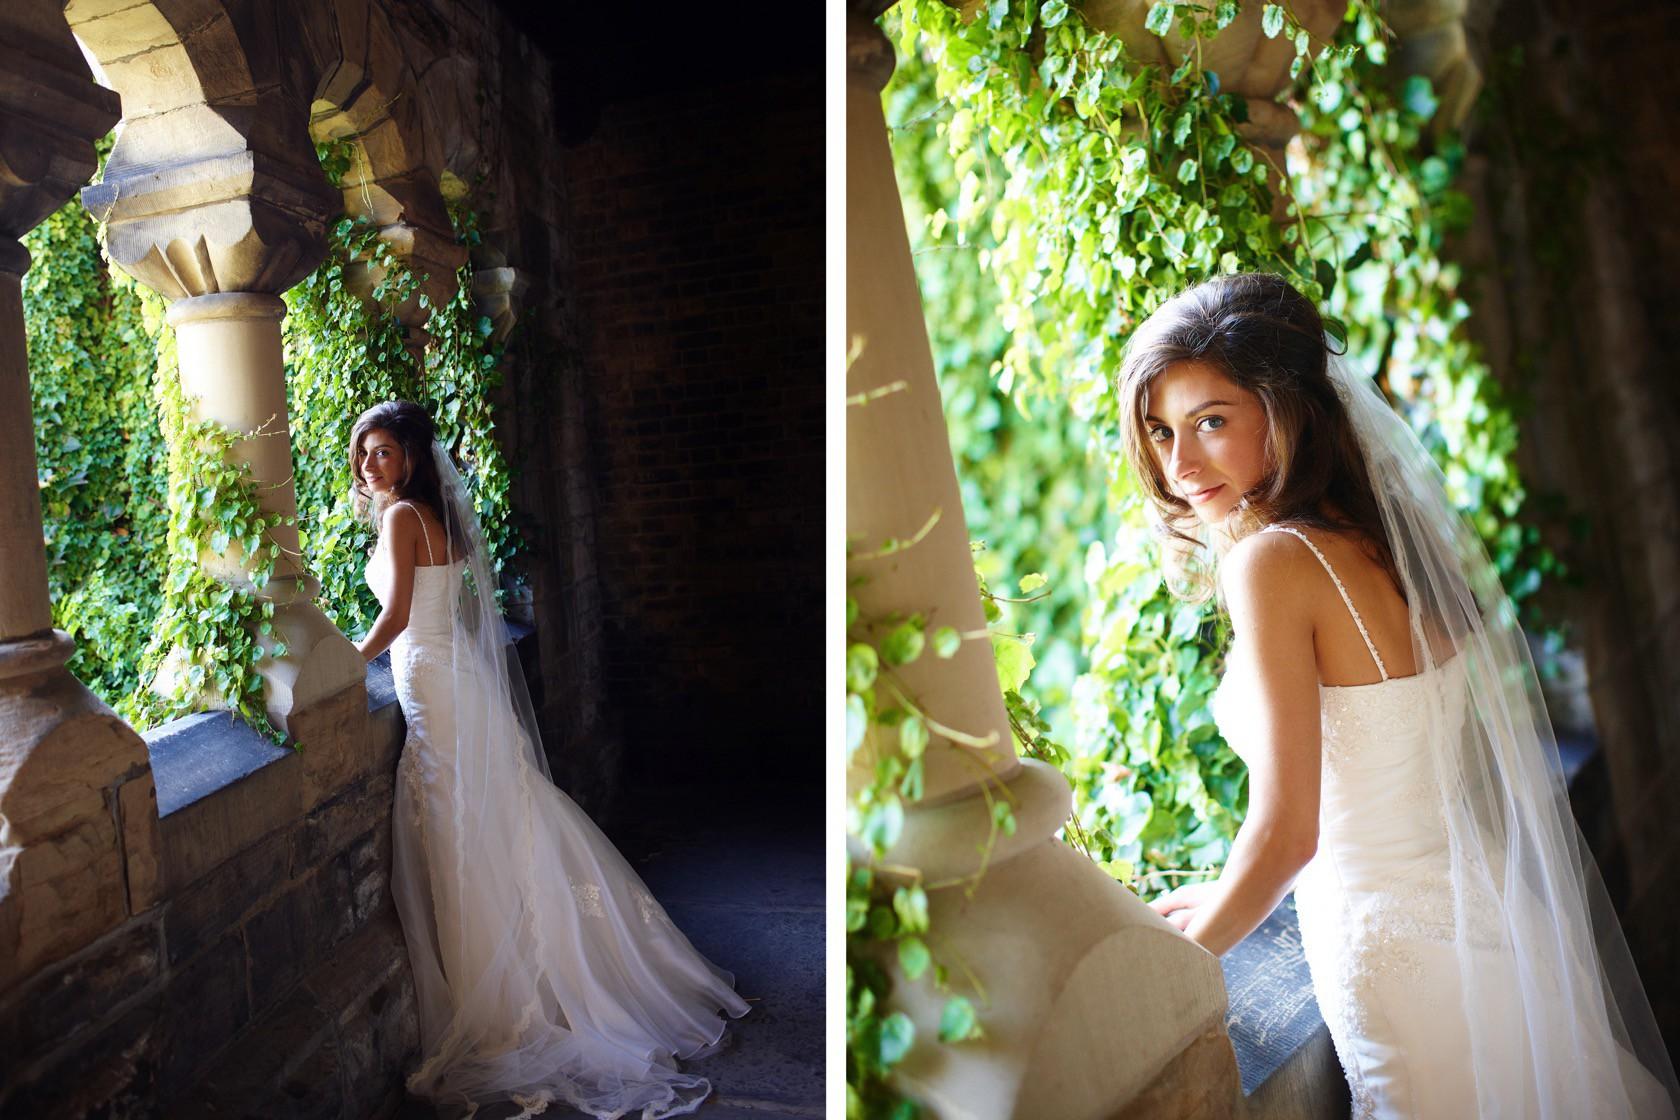 stephen sager photography 0044 fine art wedding photography